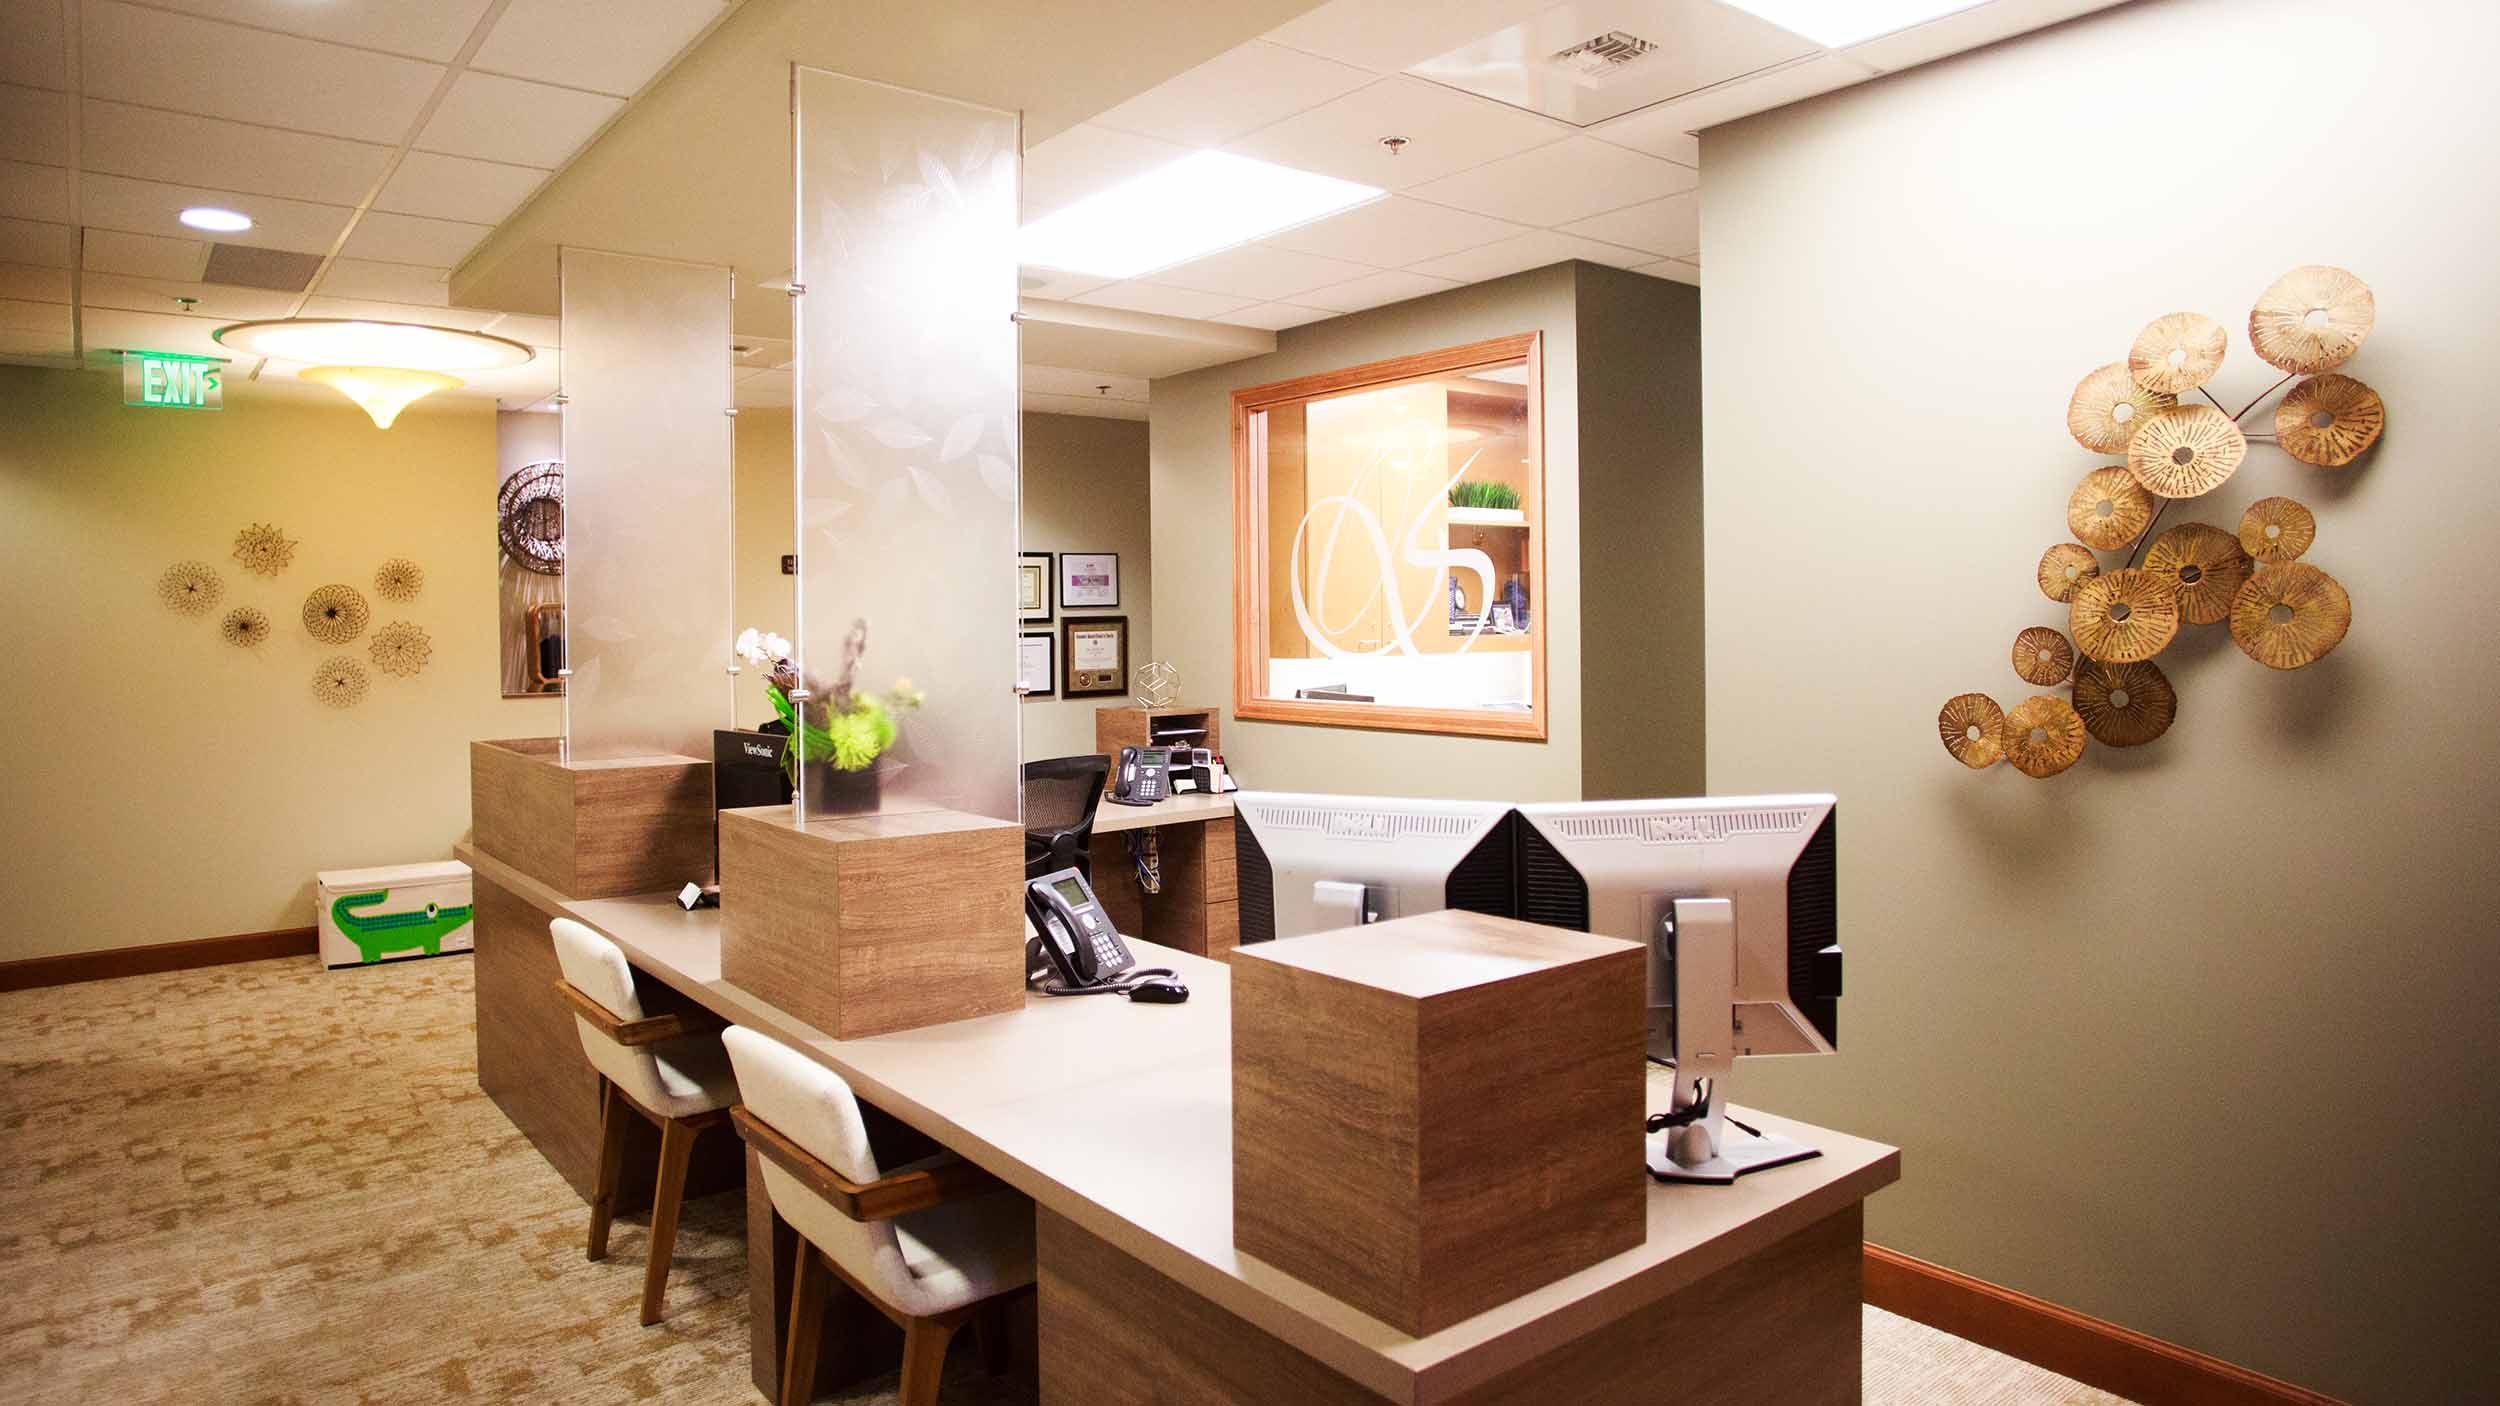 425 Dental Office Tour Web_0022_23-1643-DrOBldg.jpg